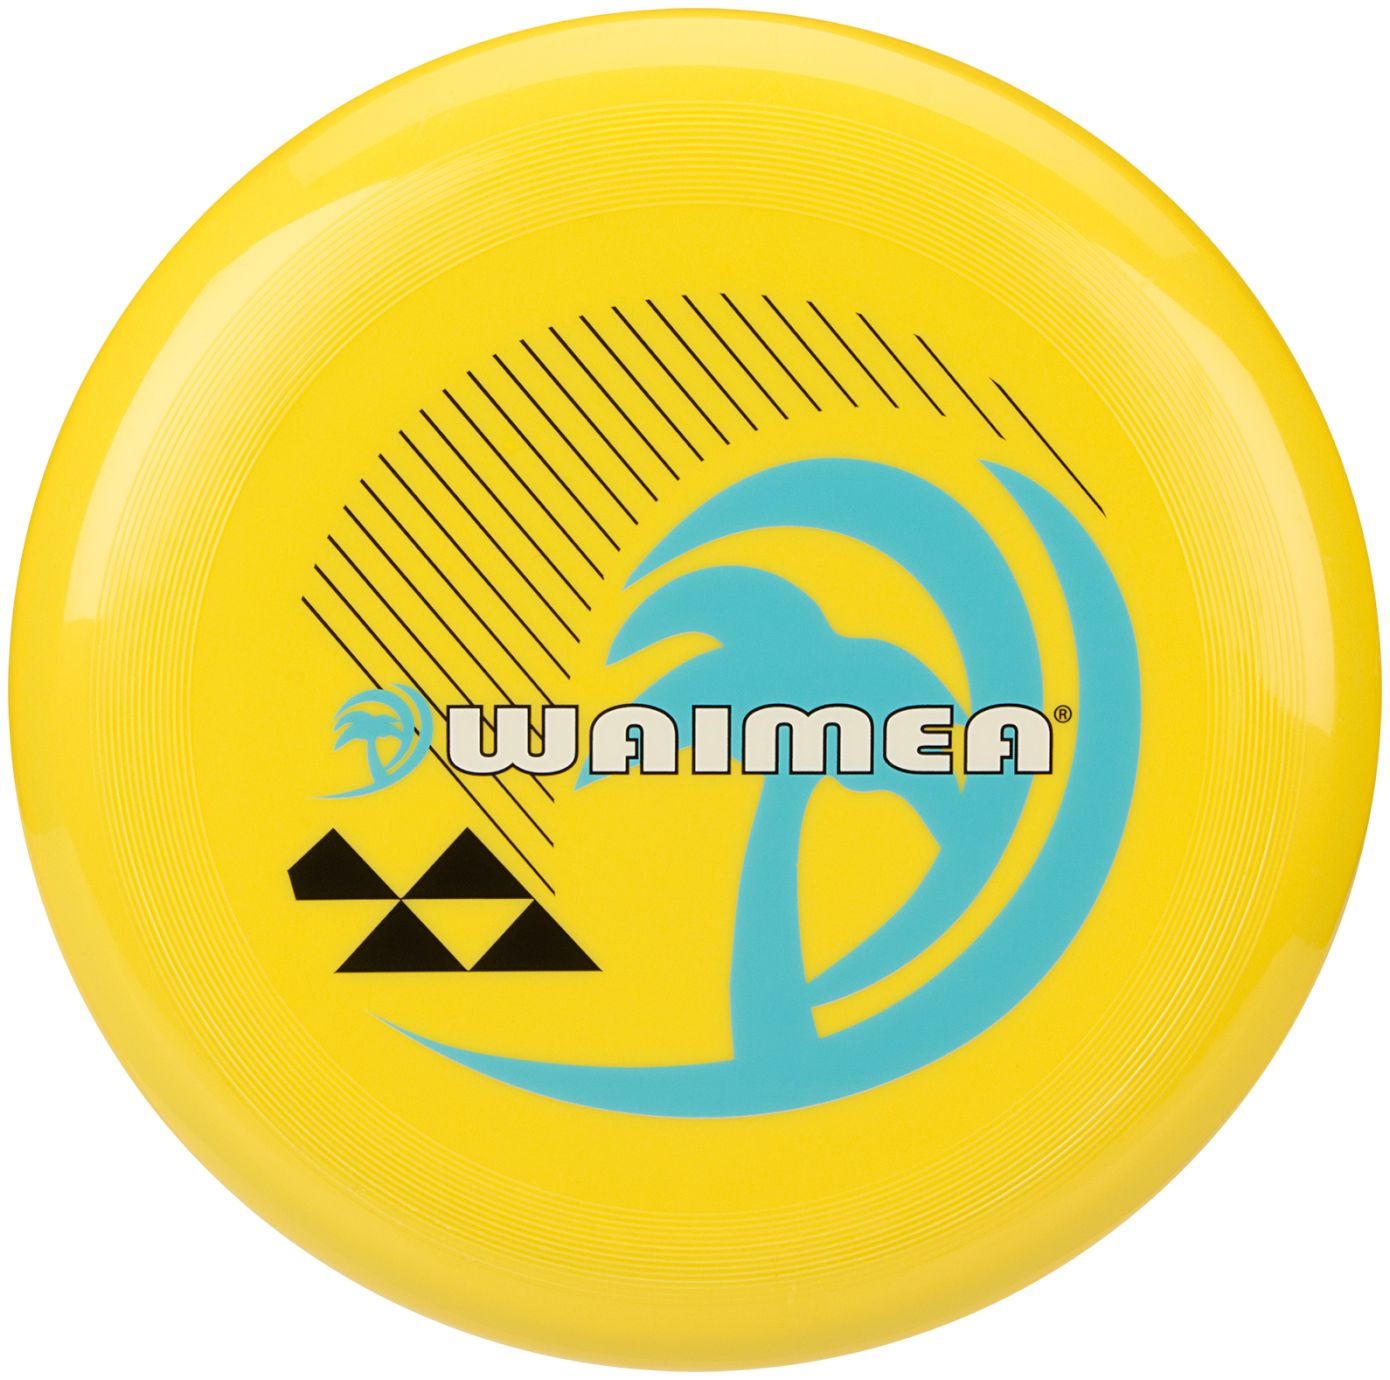 Werp Disk 27 cm • Palm Springs •